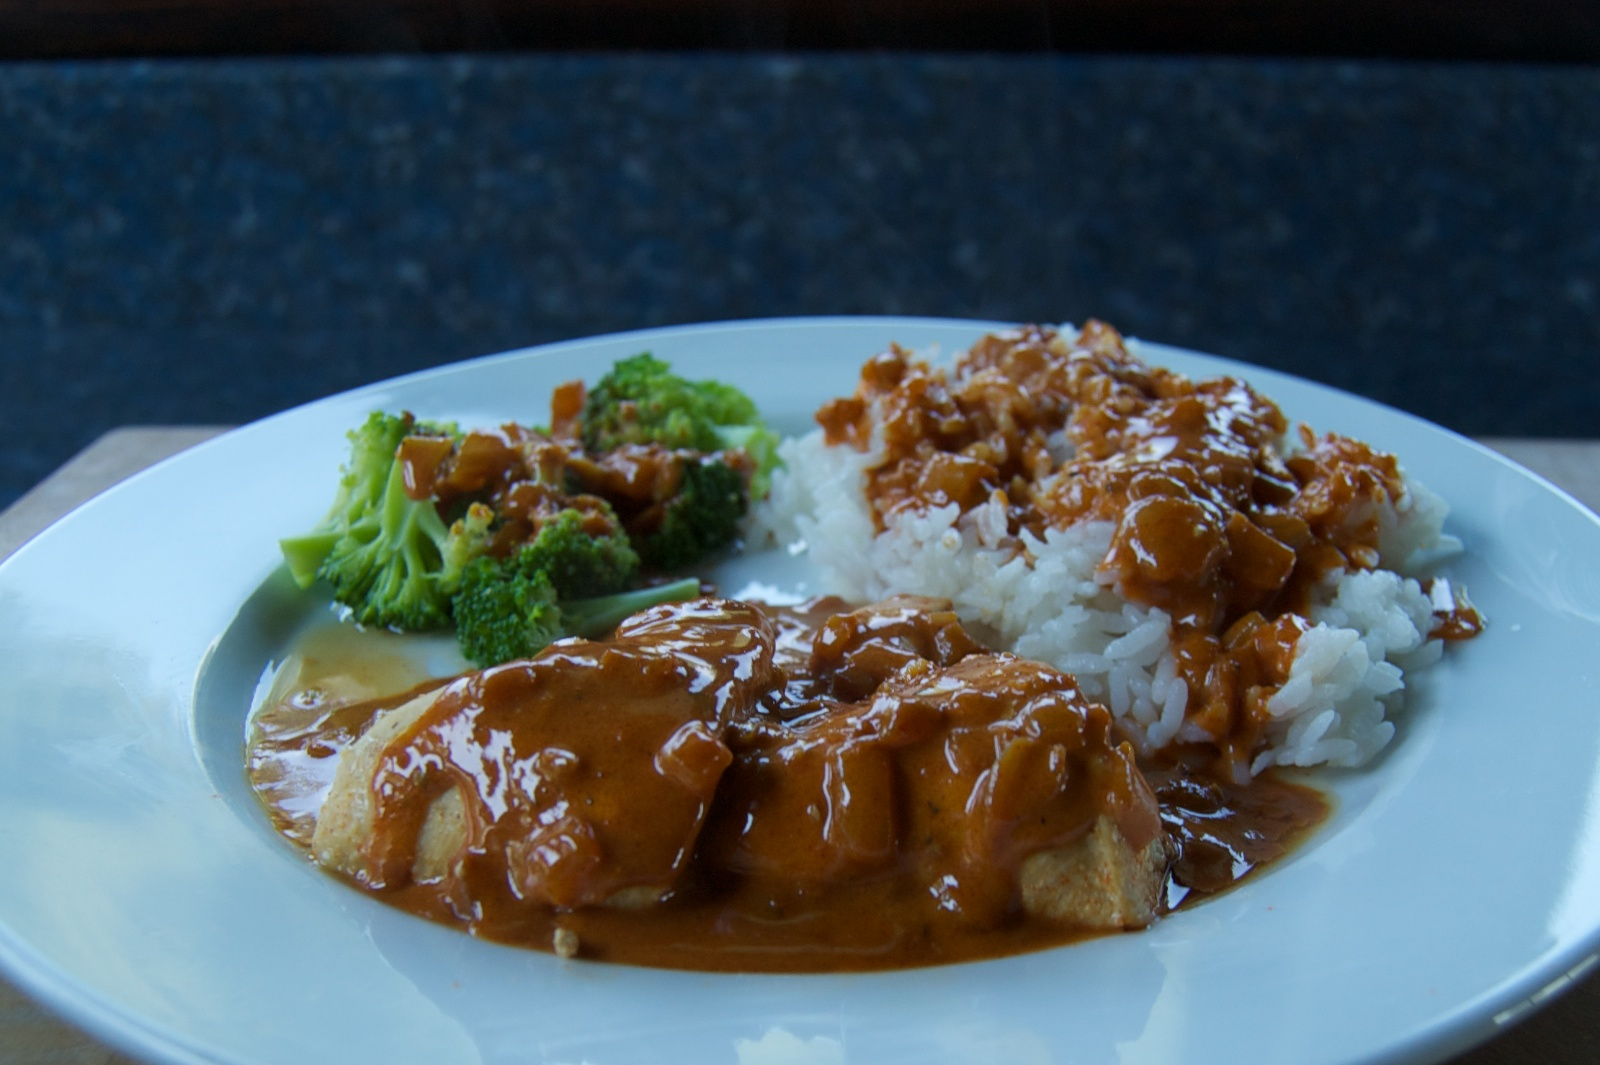 http://blog.rickk.com/food/2013/08/20/ate.2013.08.20.d.jpg